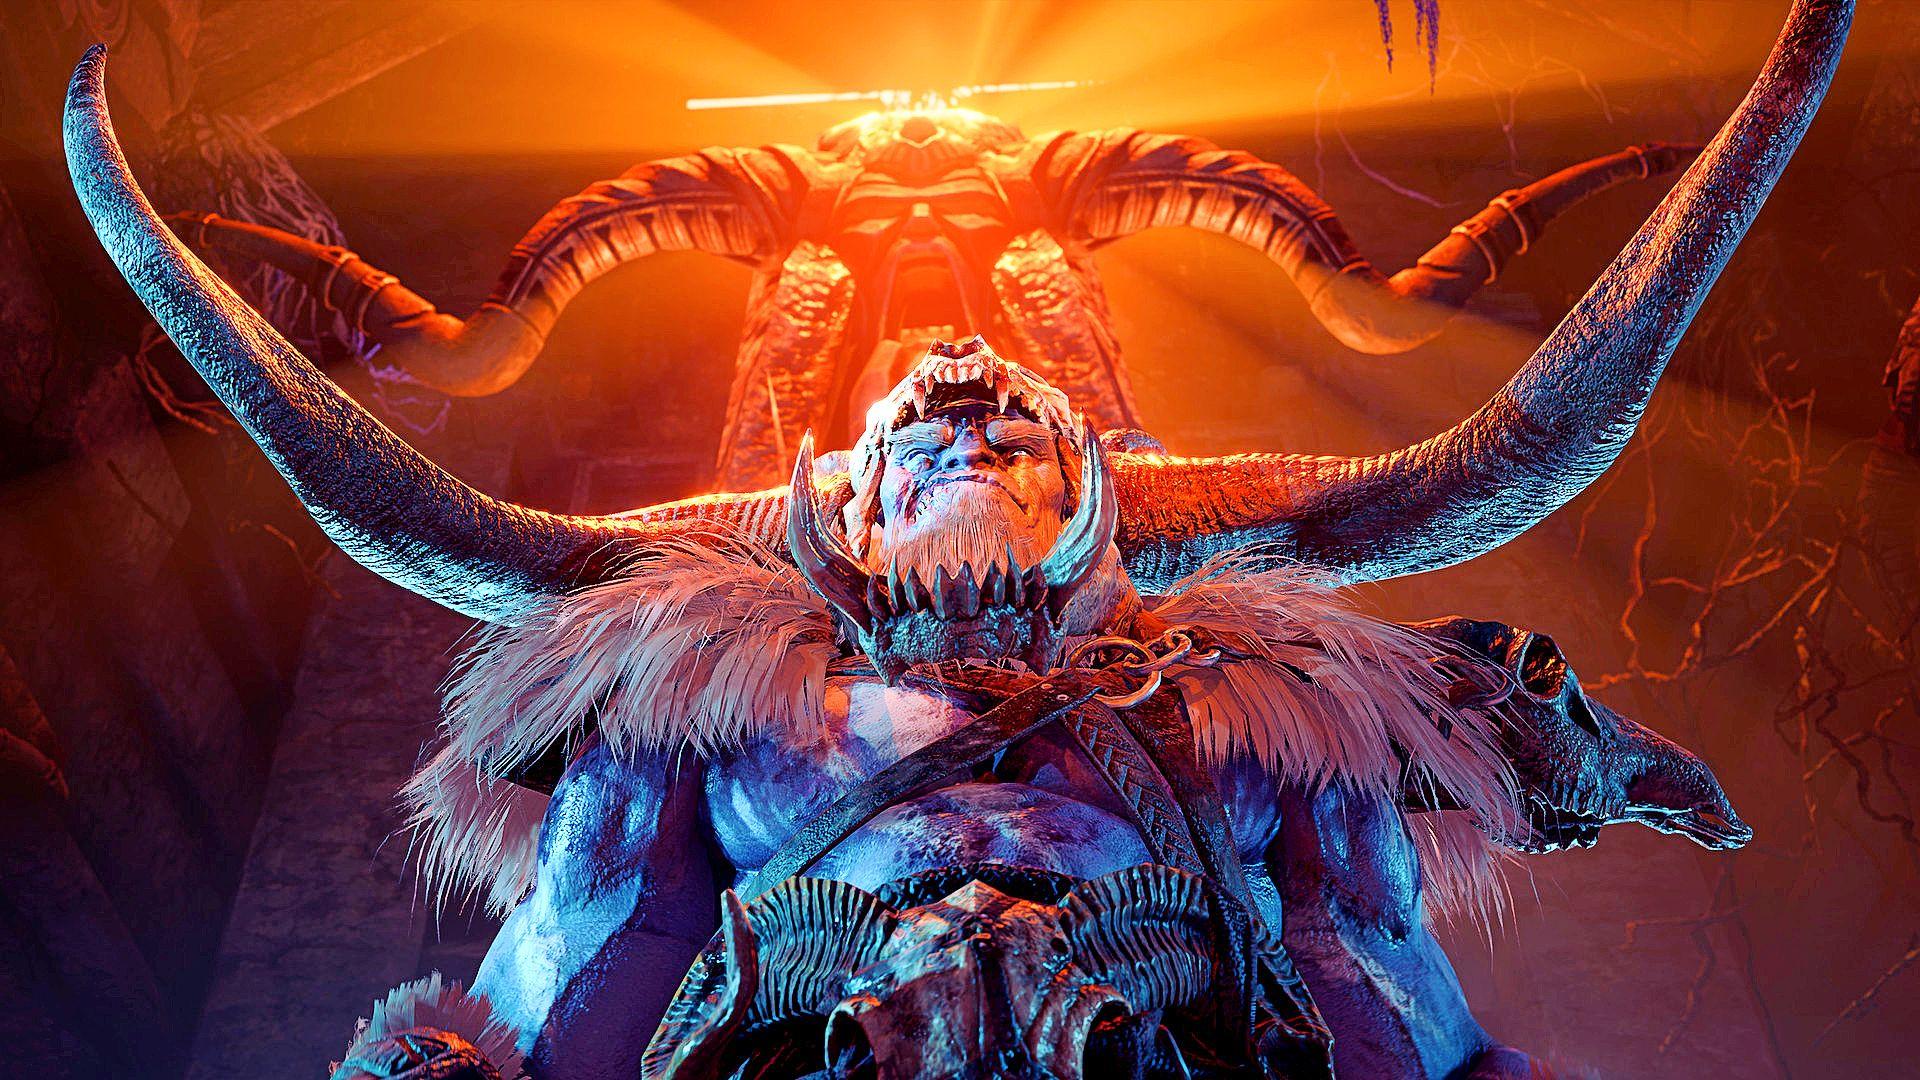 Dungeons & Dragons: Dark Alliance review – hurt me plenty